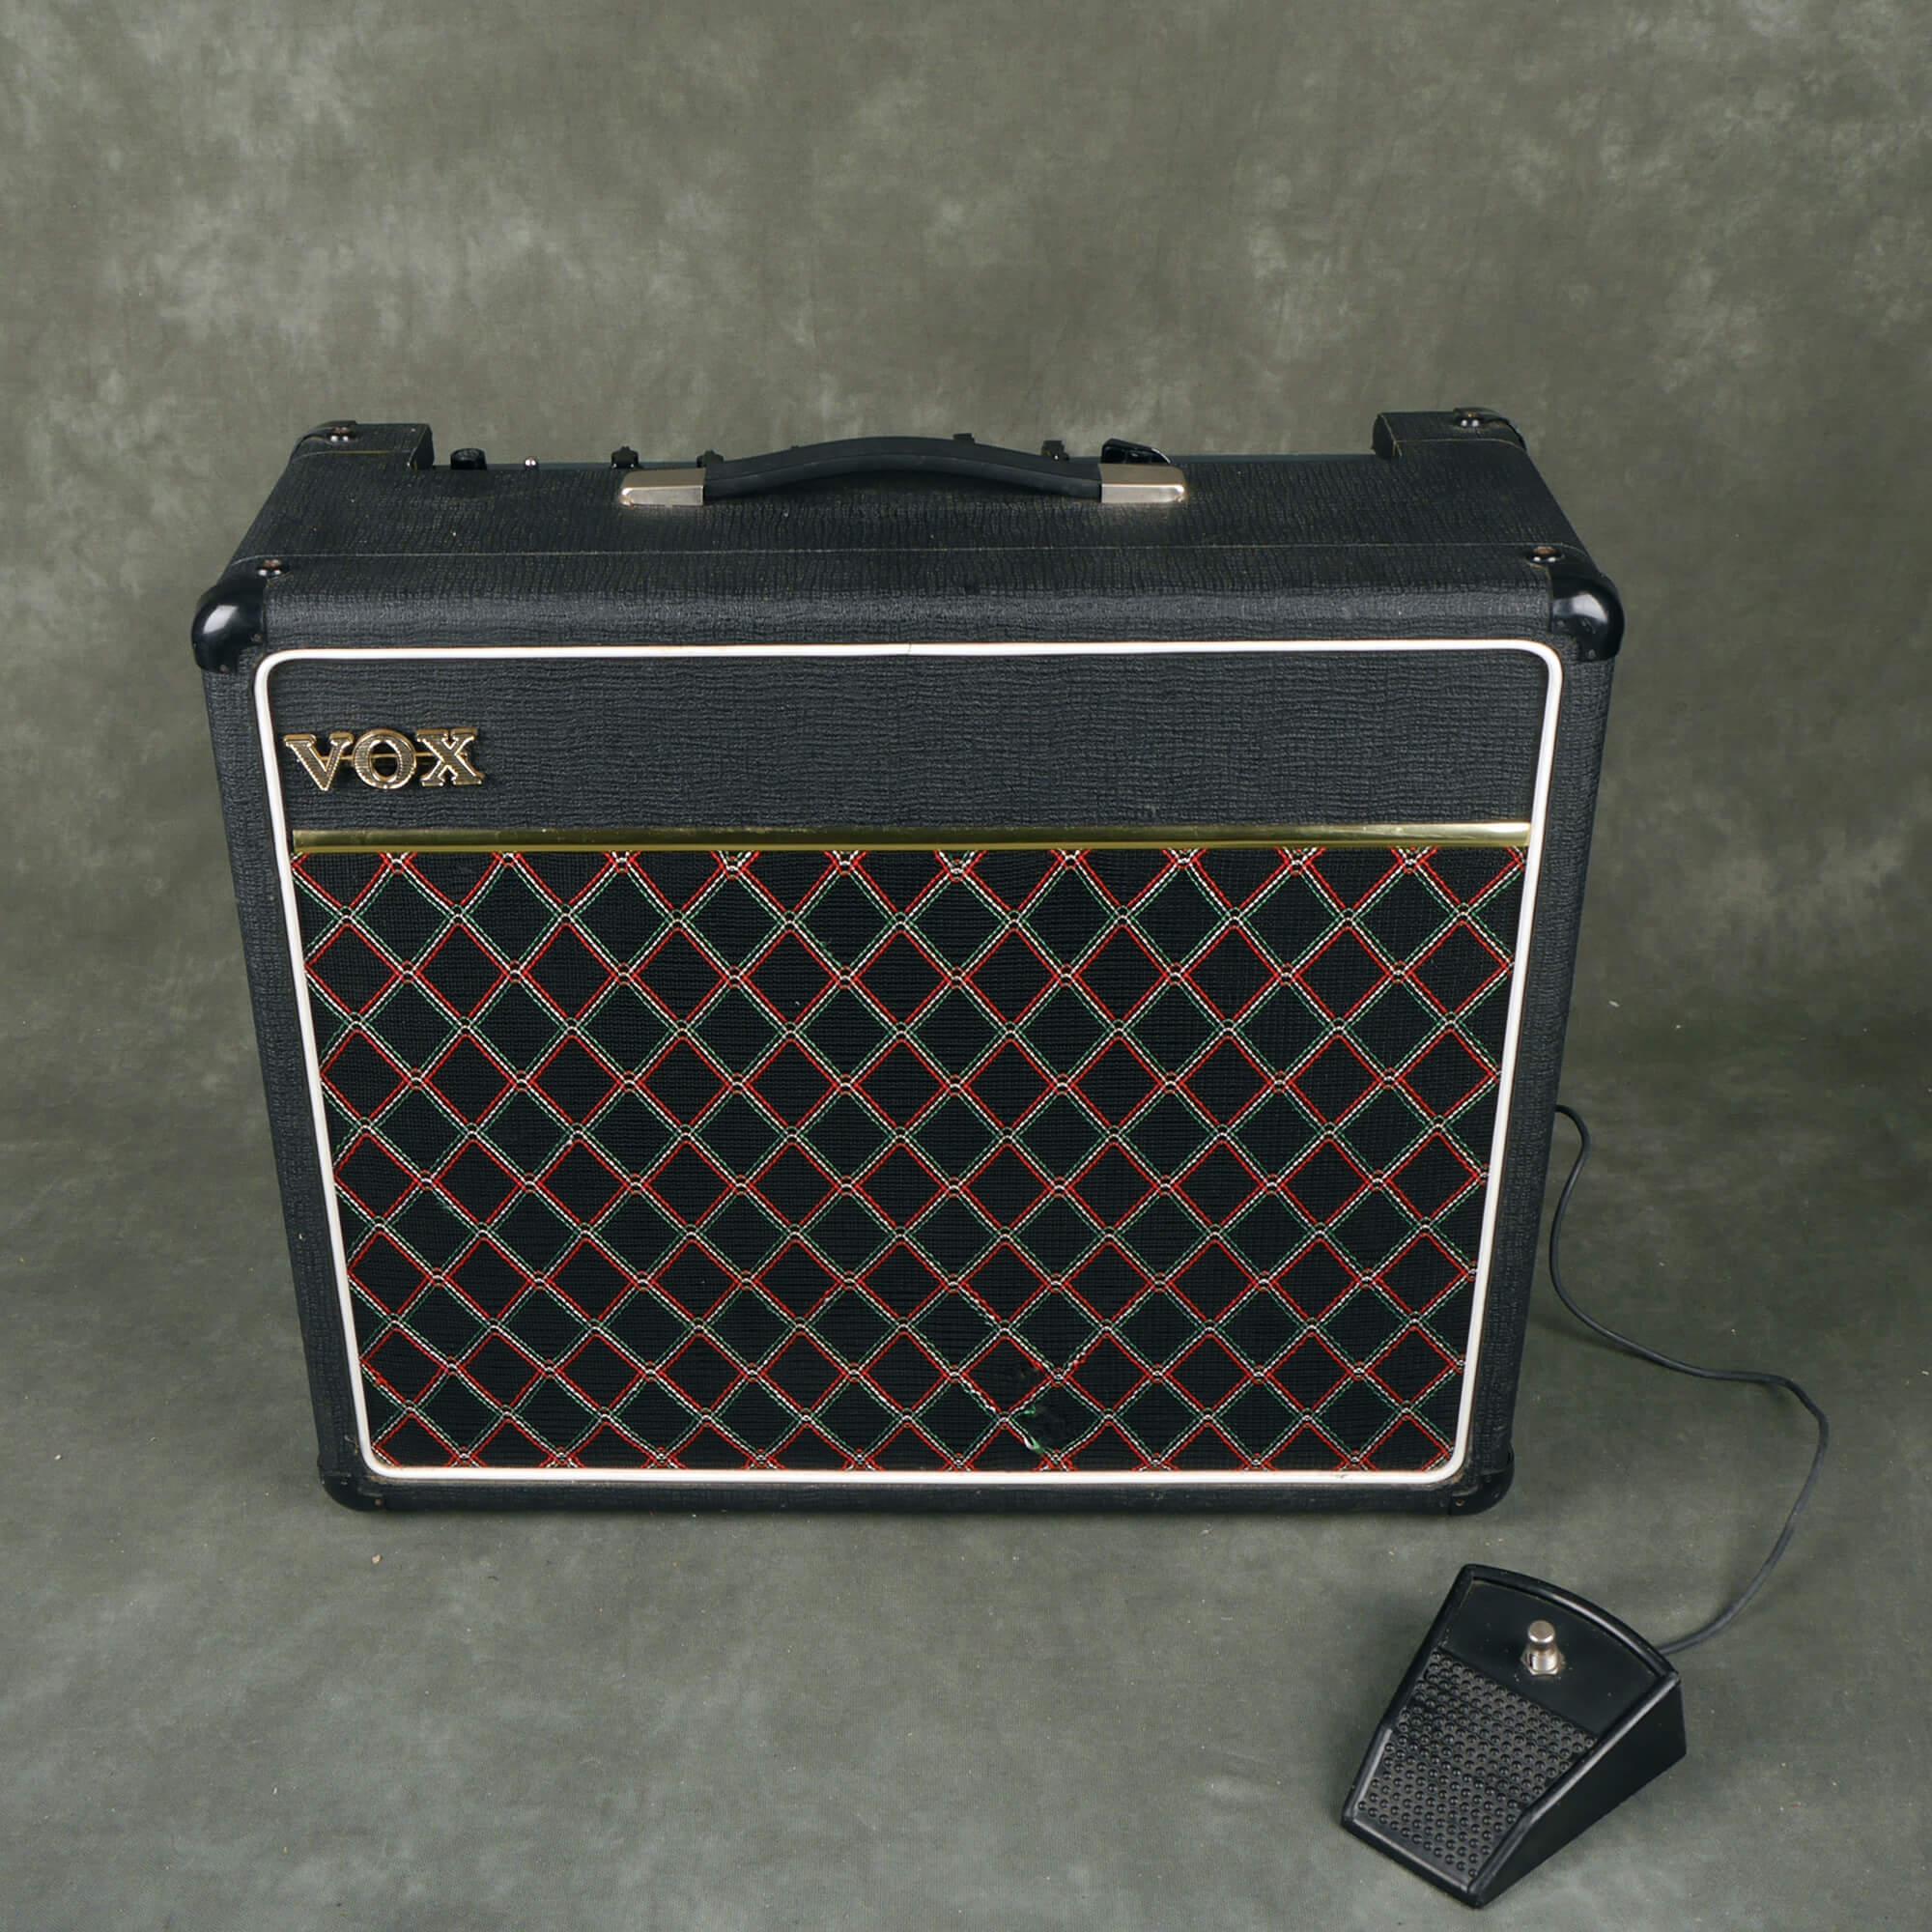 Vox Escort 30 Guitar Combo Amplifier - 2nd Hand